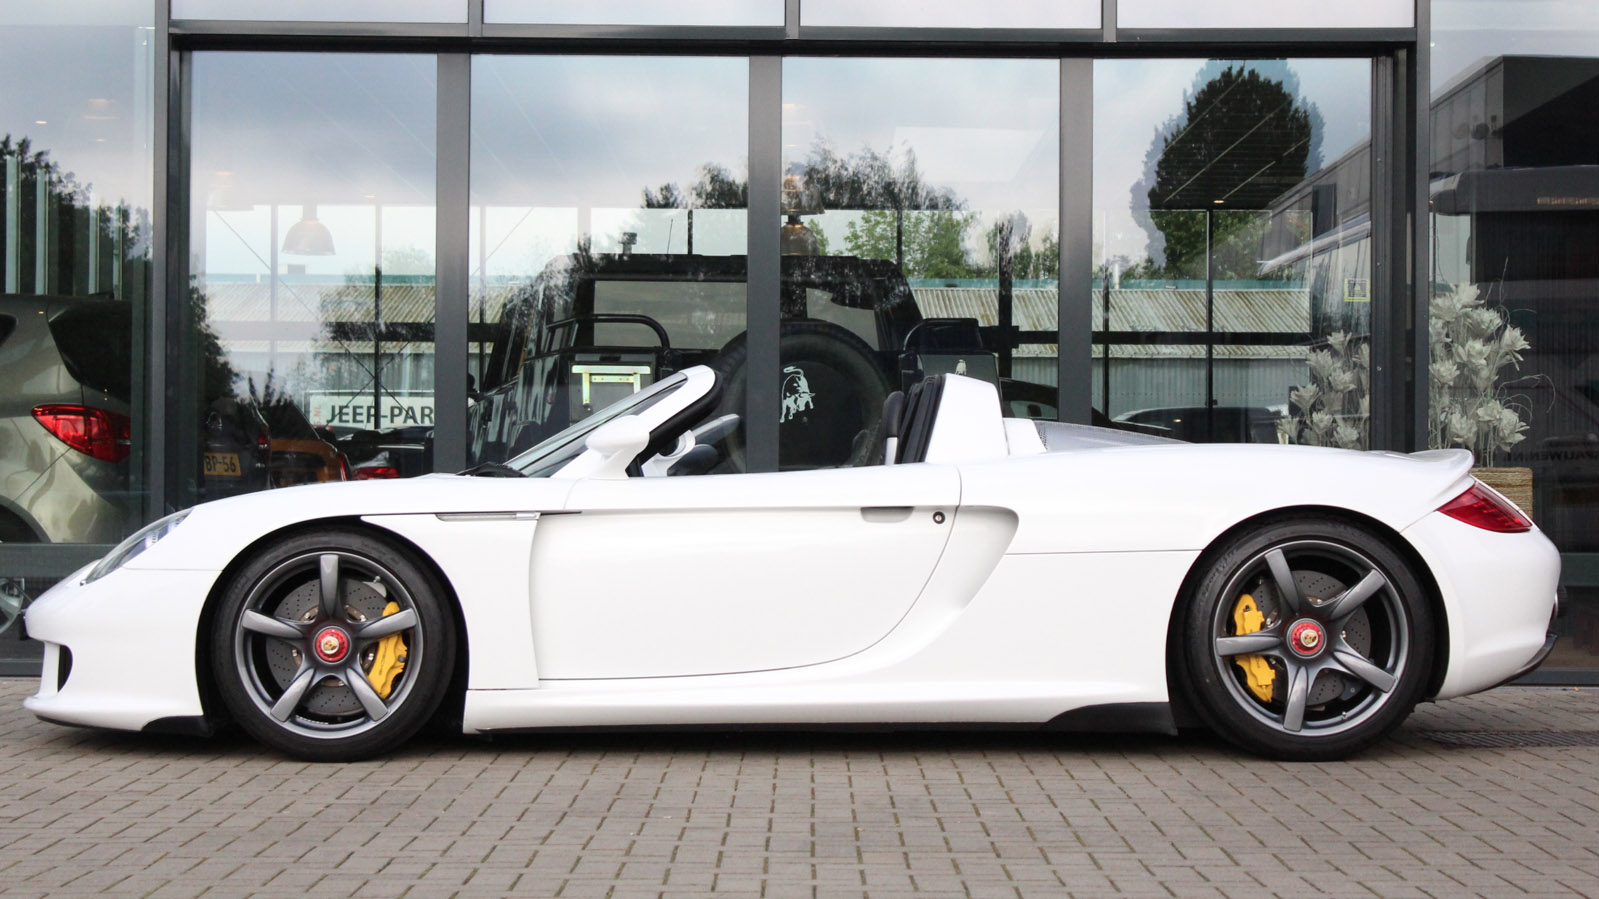 Porsche carrera gt liberty cars exclusive automotive for Motor car portfolio site inventory